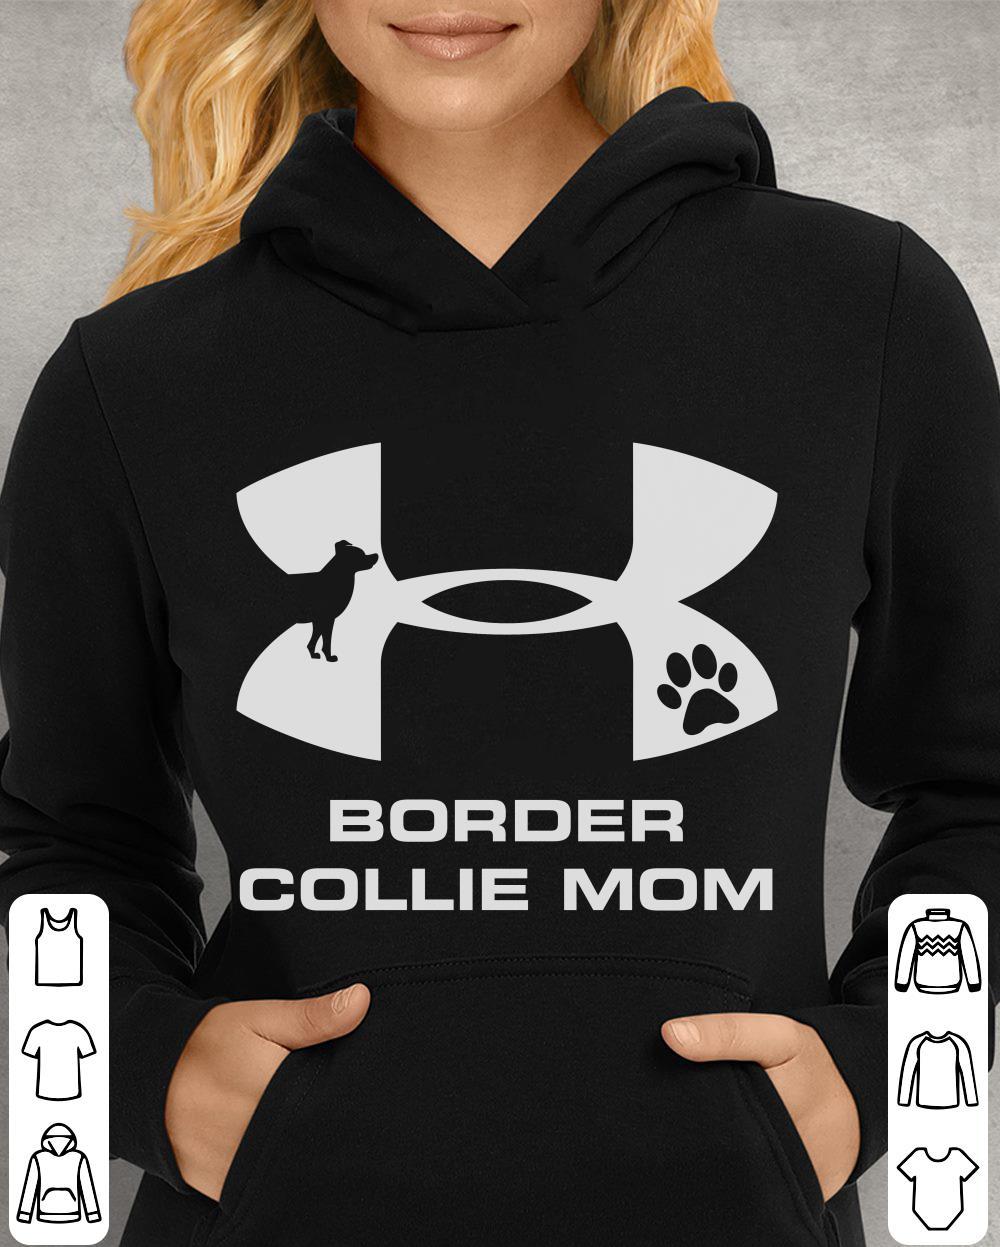 https://unicornshirts.net/images/2018/11/Under-Armour-Border-Collie-Mom-Shirt_4.jpg